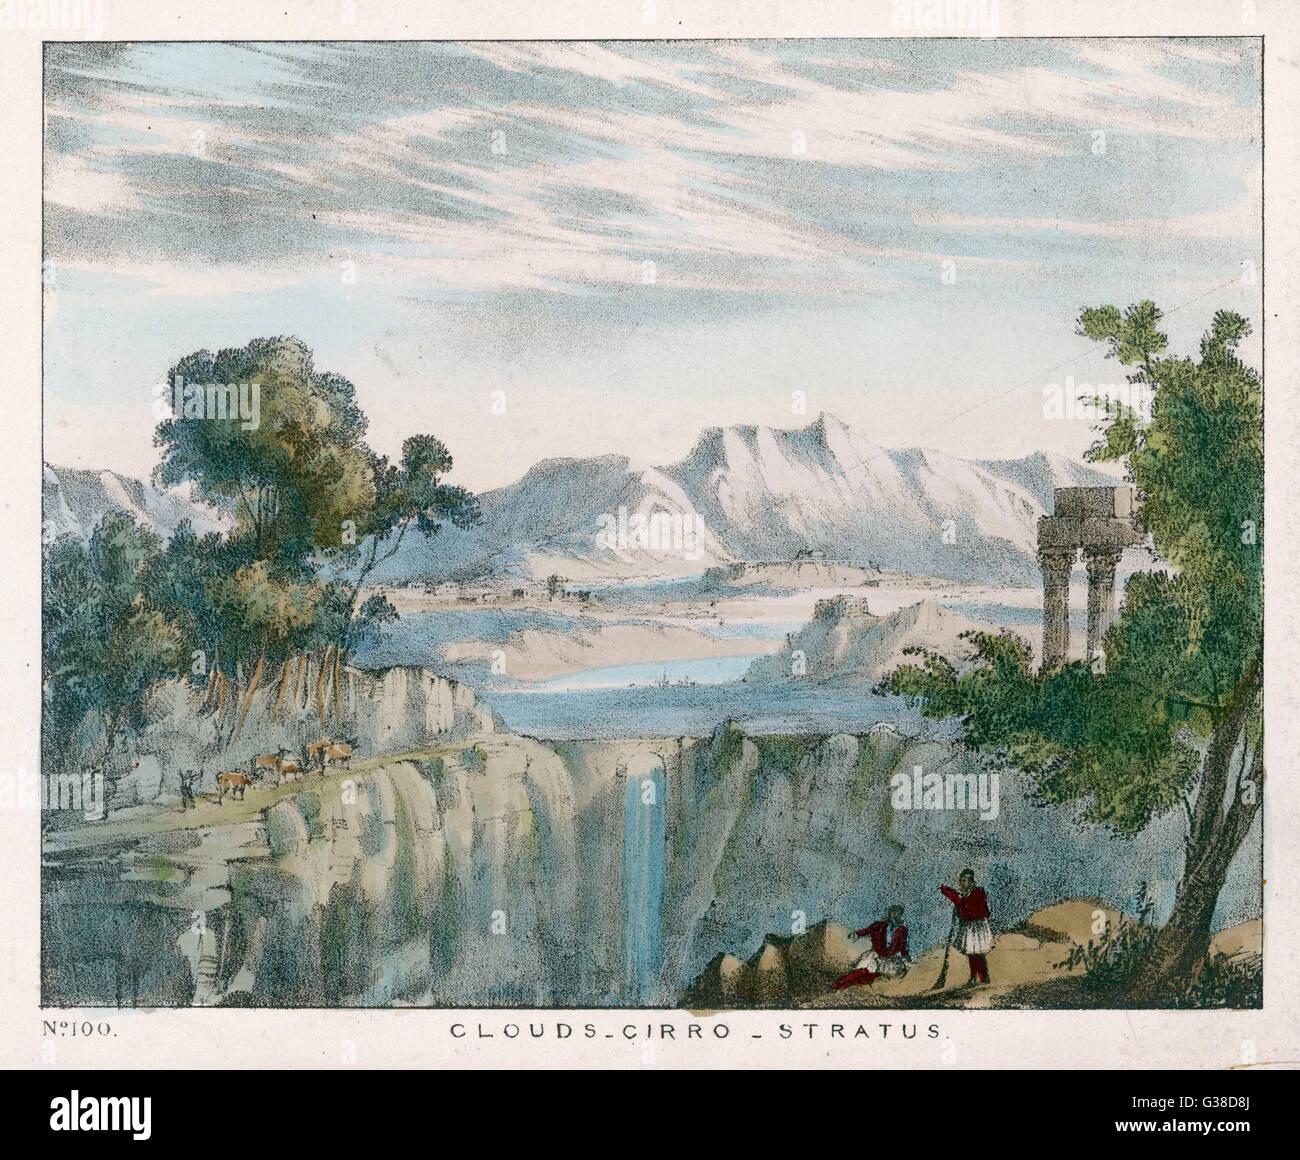 Un paysage rocheux avec cirro-stratus. Date: 1849 Photo Stock